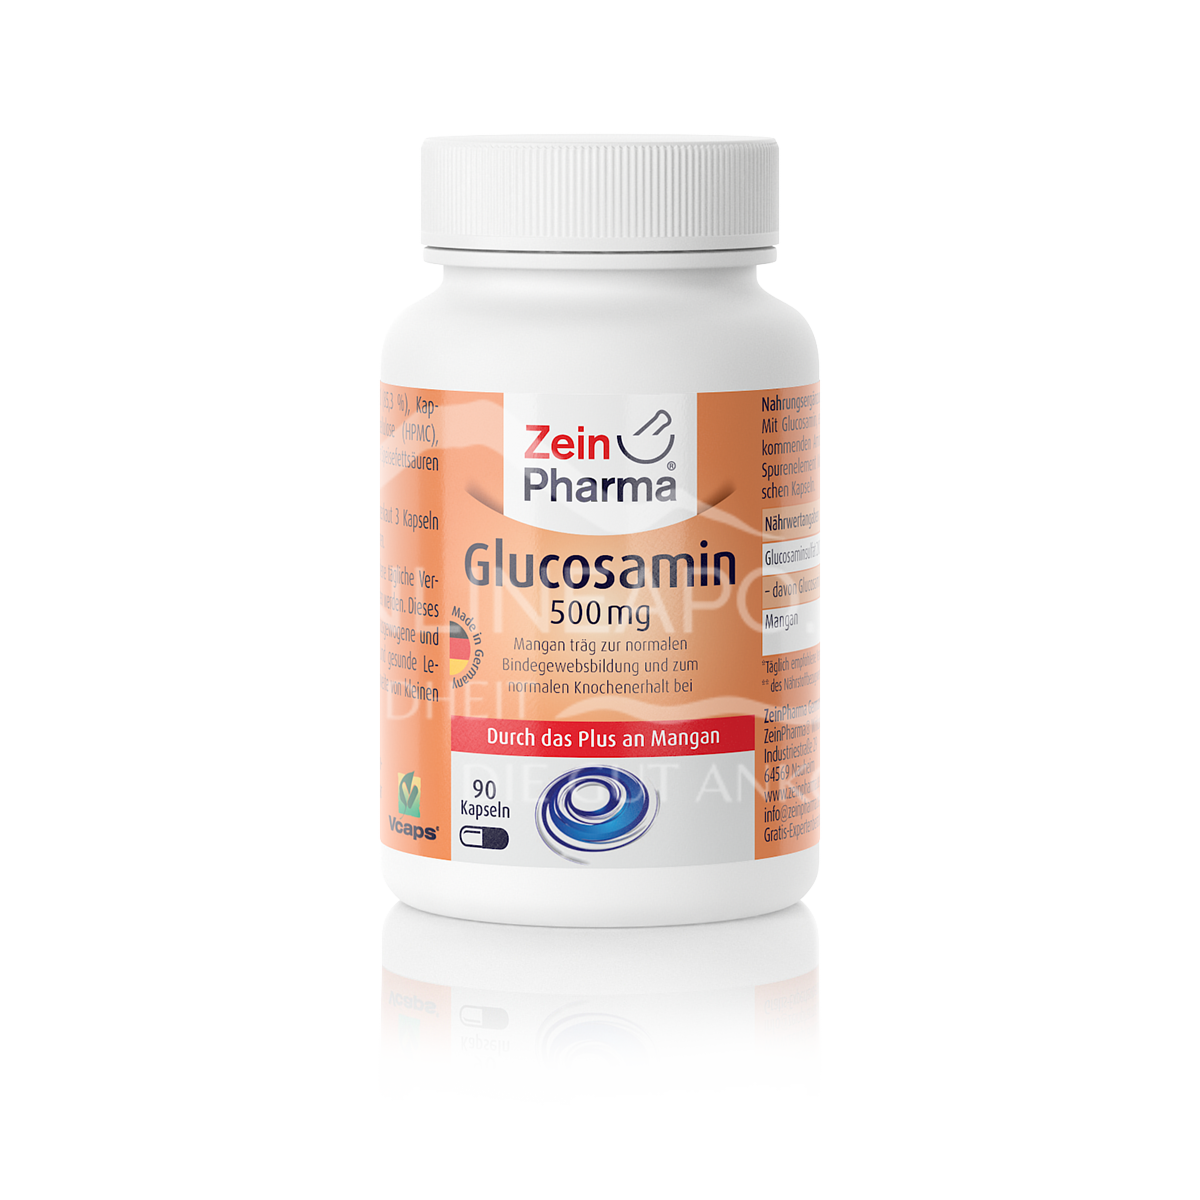 Zeinpharma Glucosamin +Mangan Kapseln